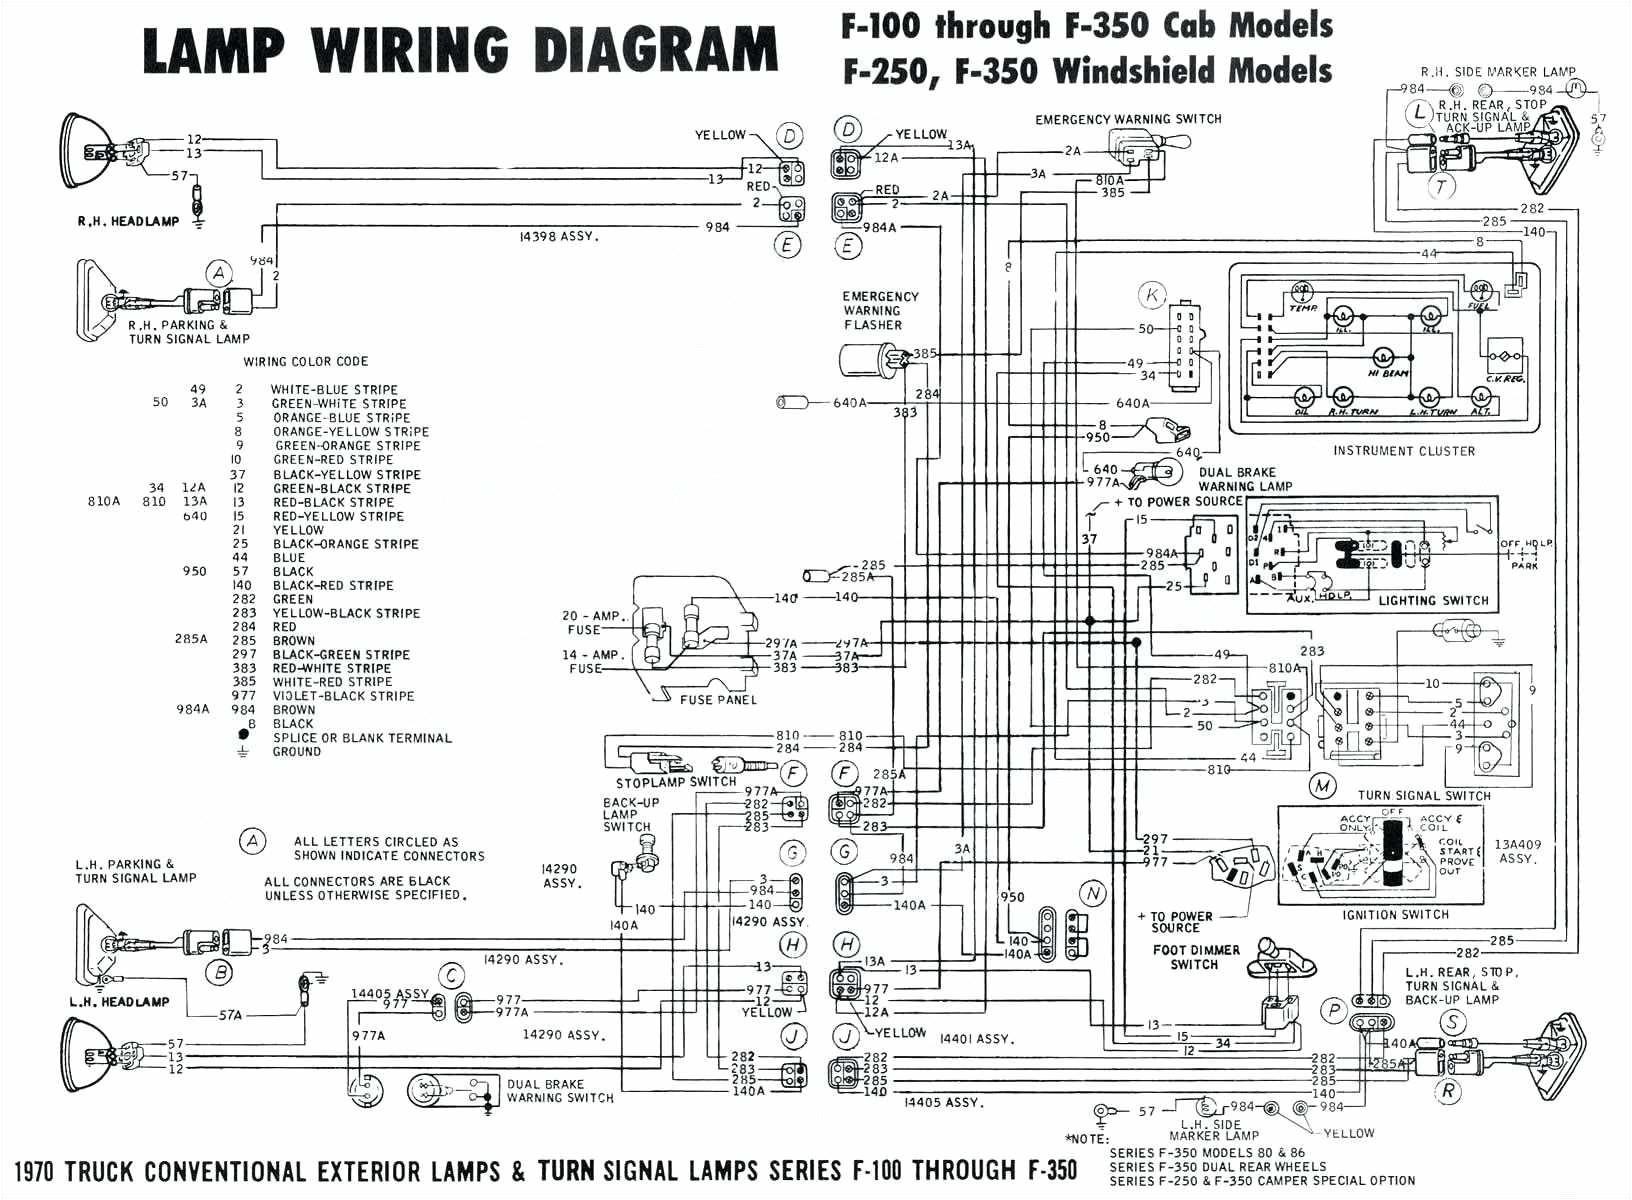 2018 Jeep Wrangler Wiring Diagram Eurovan Stereo Wiring Diagram Blog Wiring Diagram